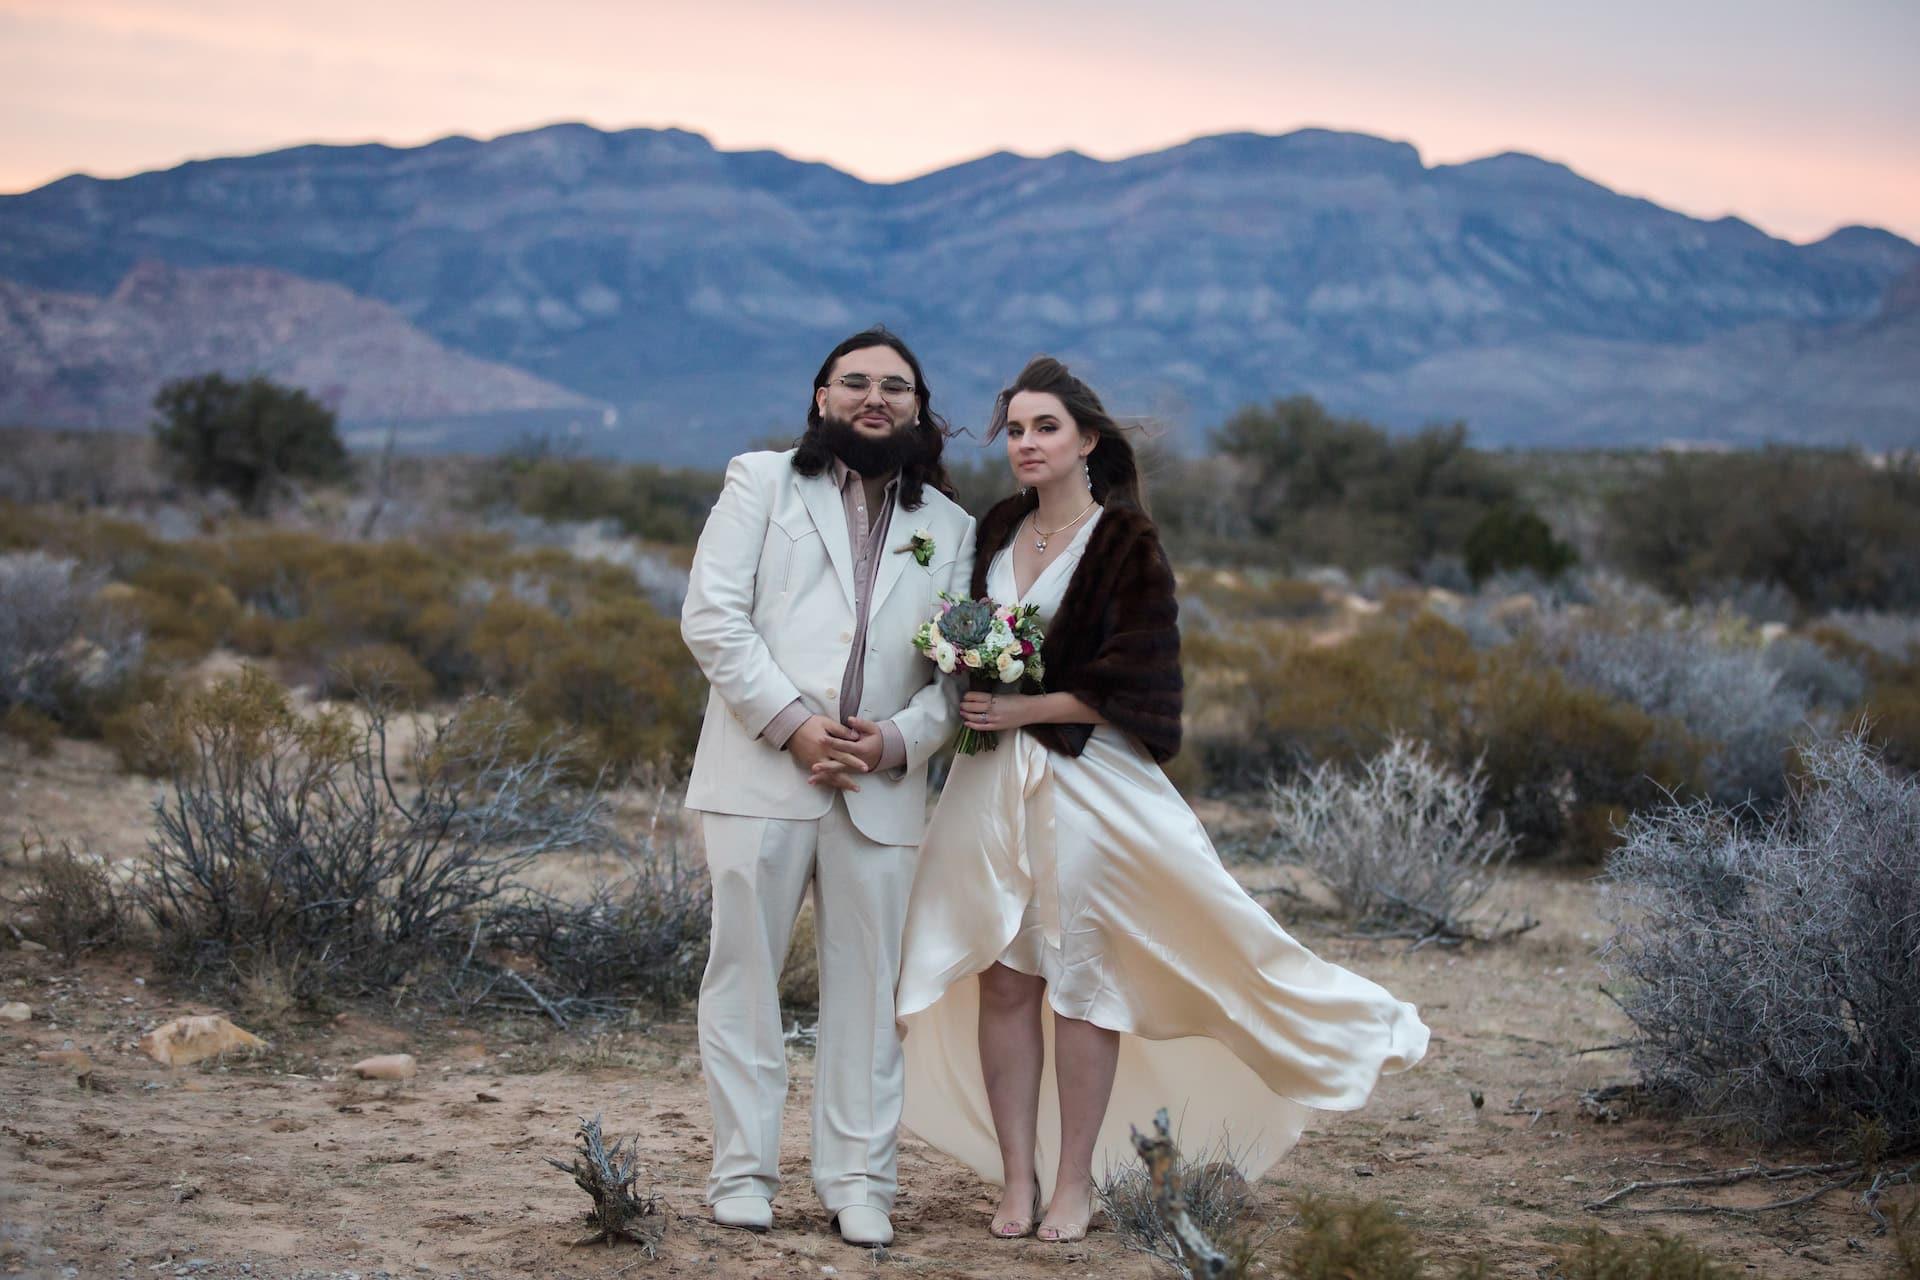 Jessica + Marcos eloping in Las Vegas.